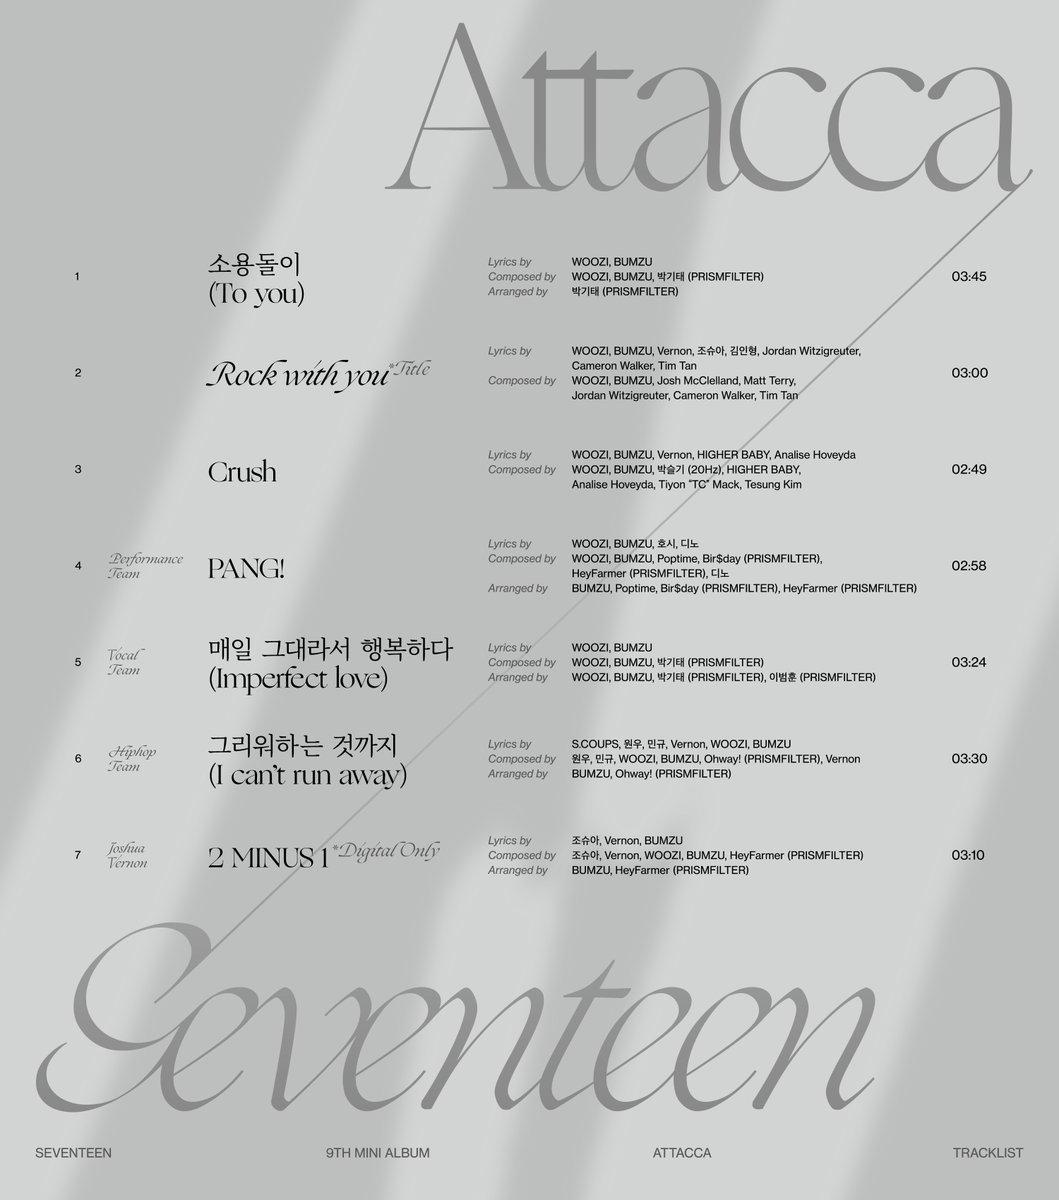 [影音] SEVENTEEN 'Attacca' 專輯試聽